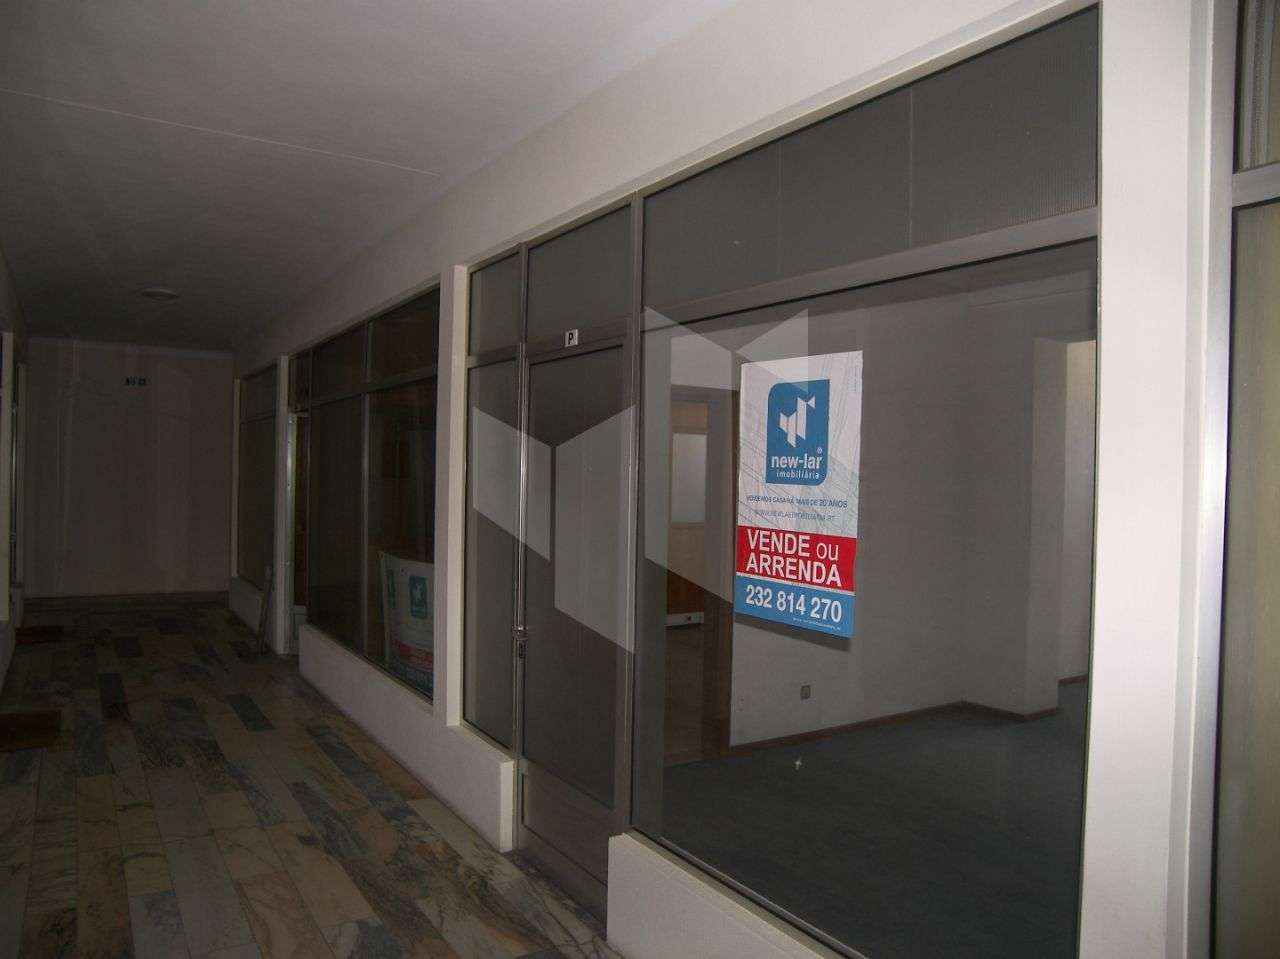 Escritório para arrendar, Tondela e Nandufe, Tondela, Viseu - Foto 1